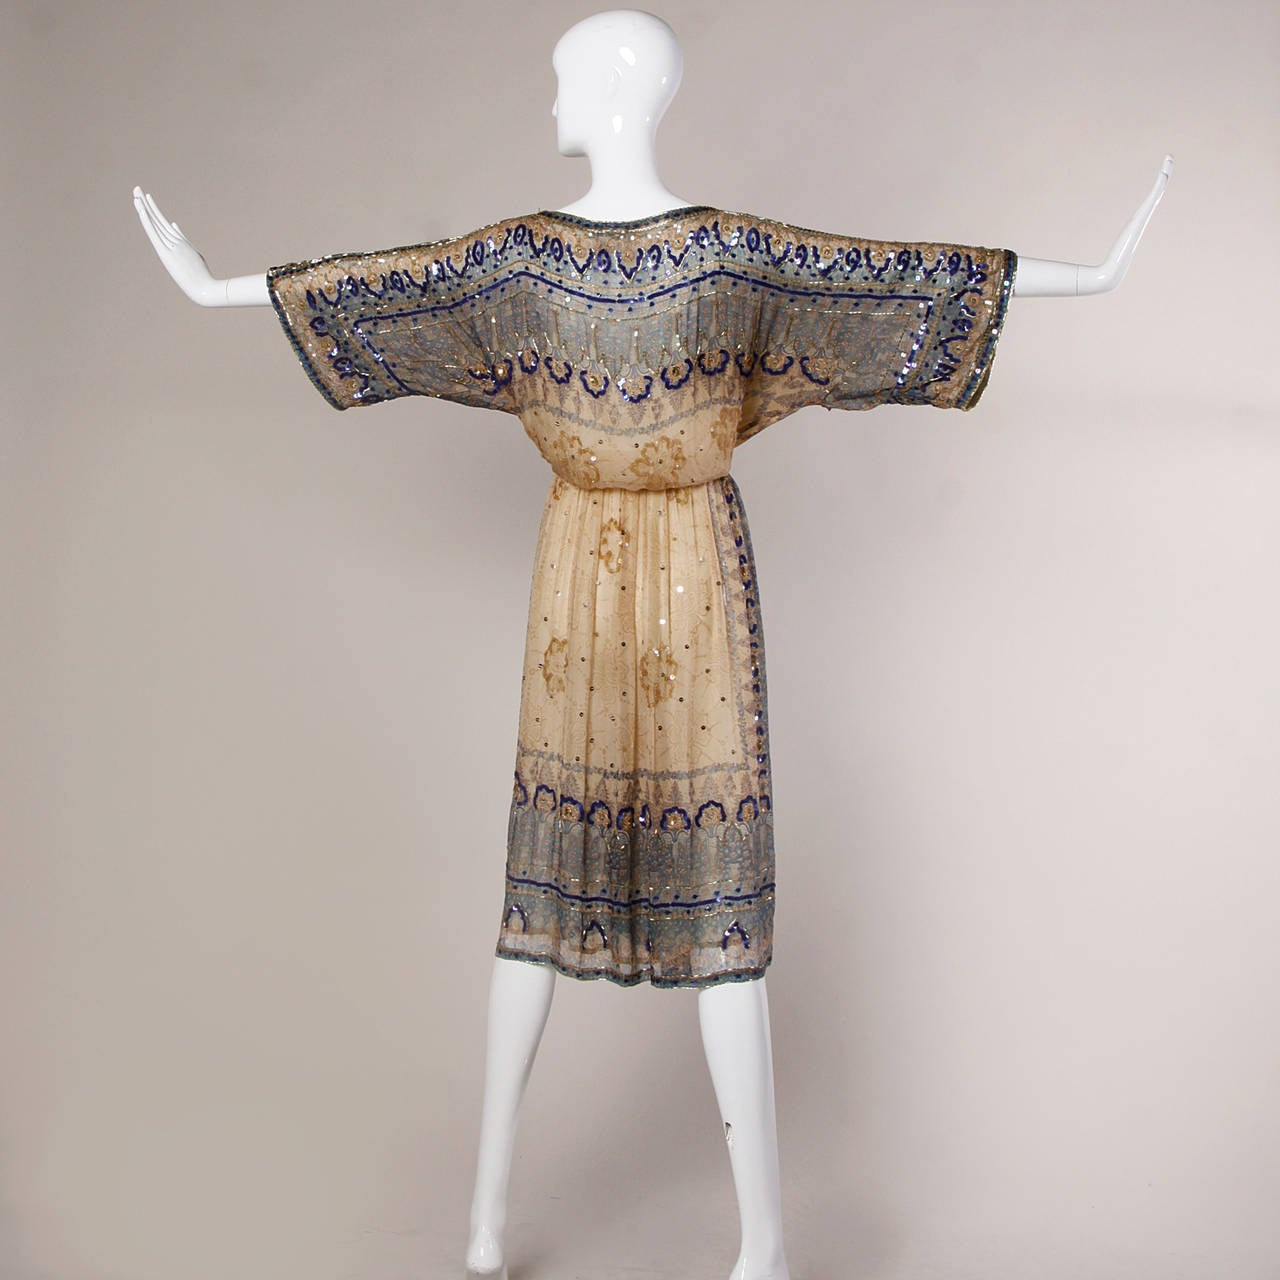 Judith Ann for Bullock's Wilshire Vintage 1970s Silk India Print Dress 6